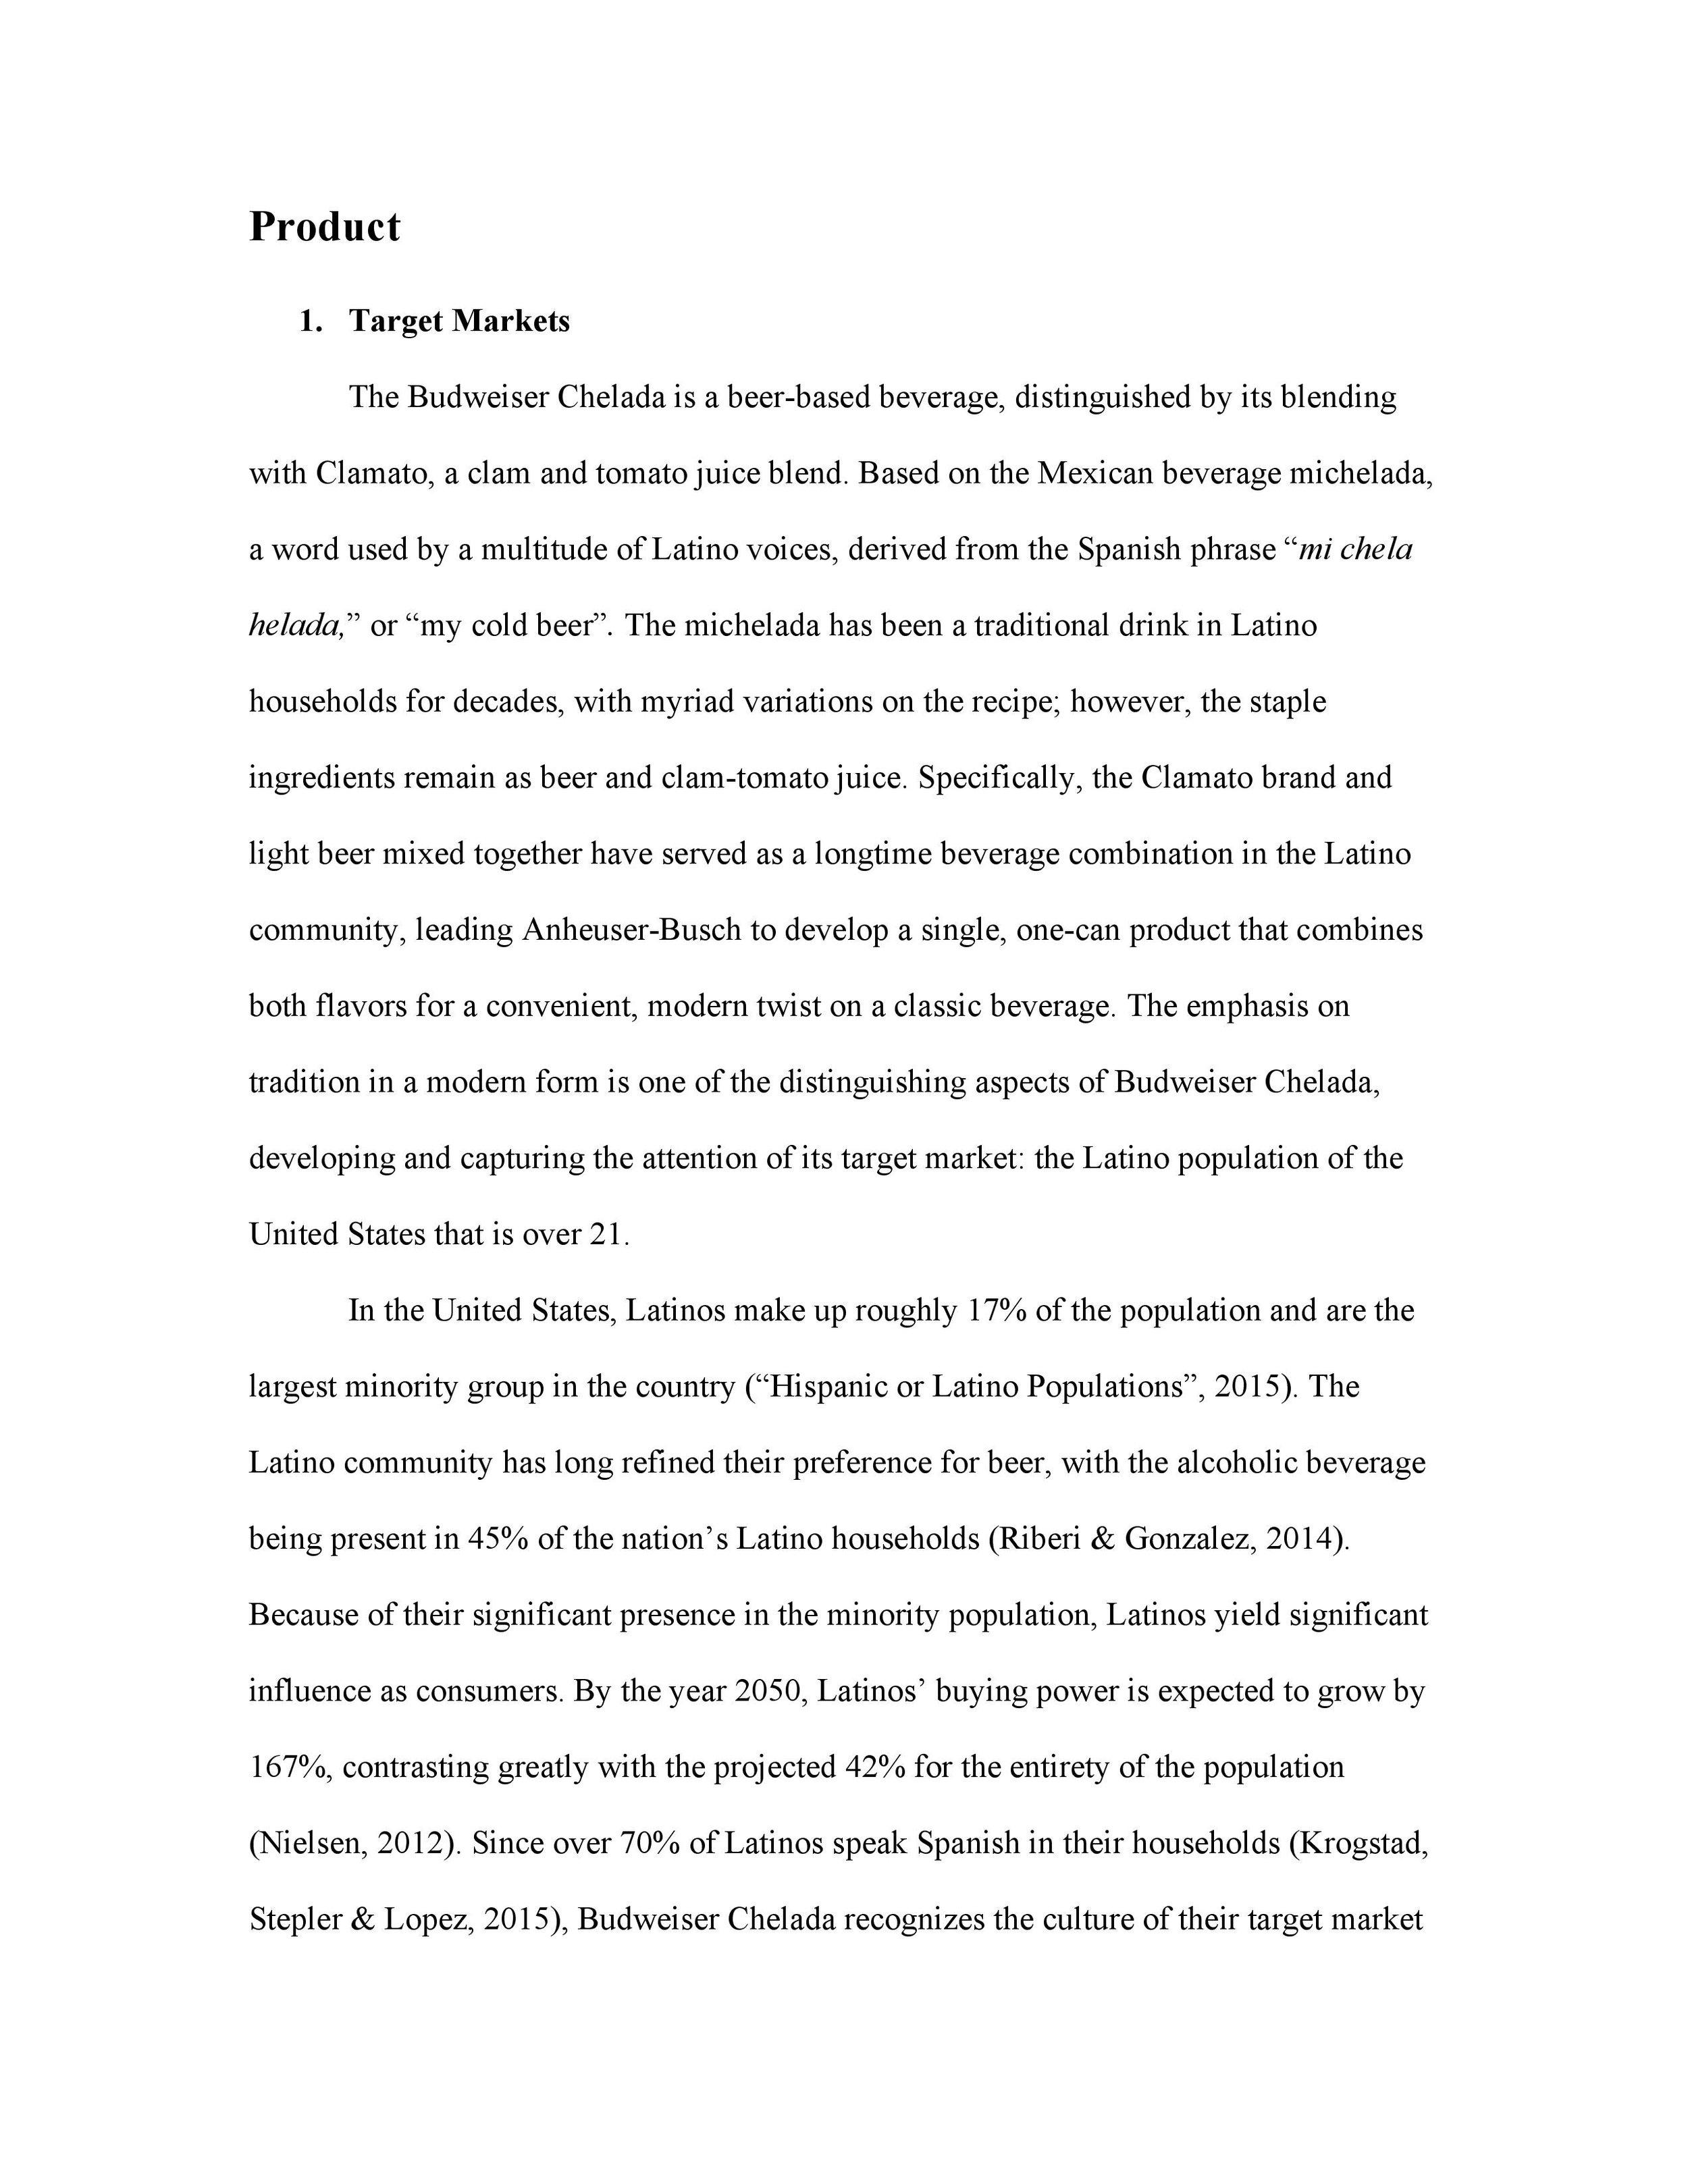 Product - Chelada-page-001.jpg